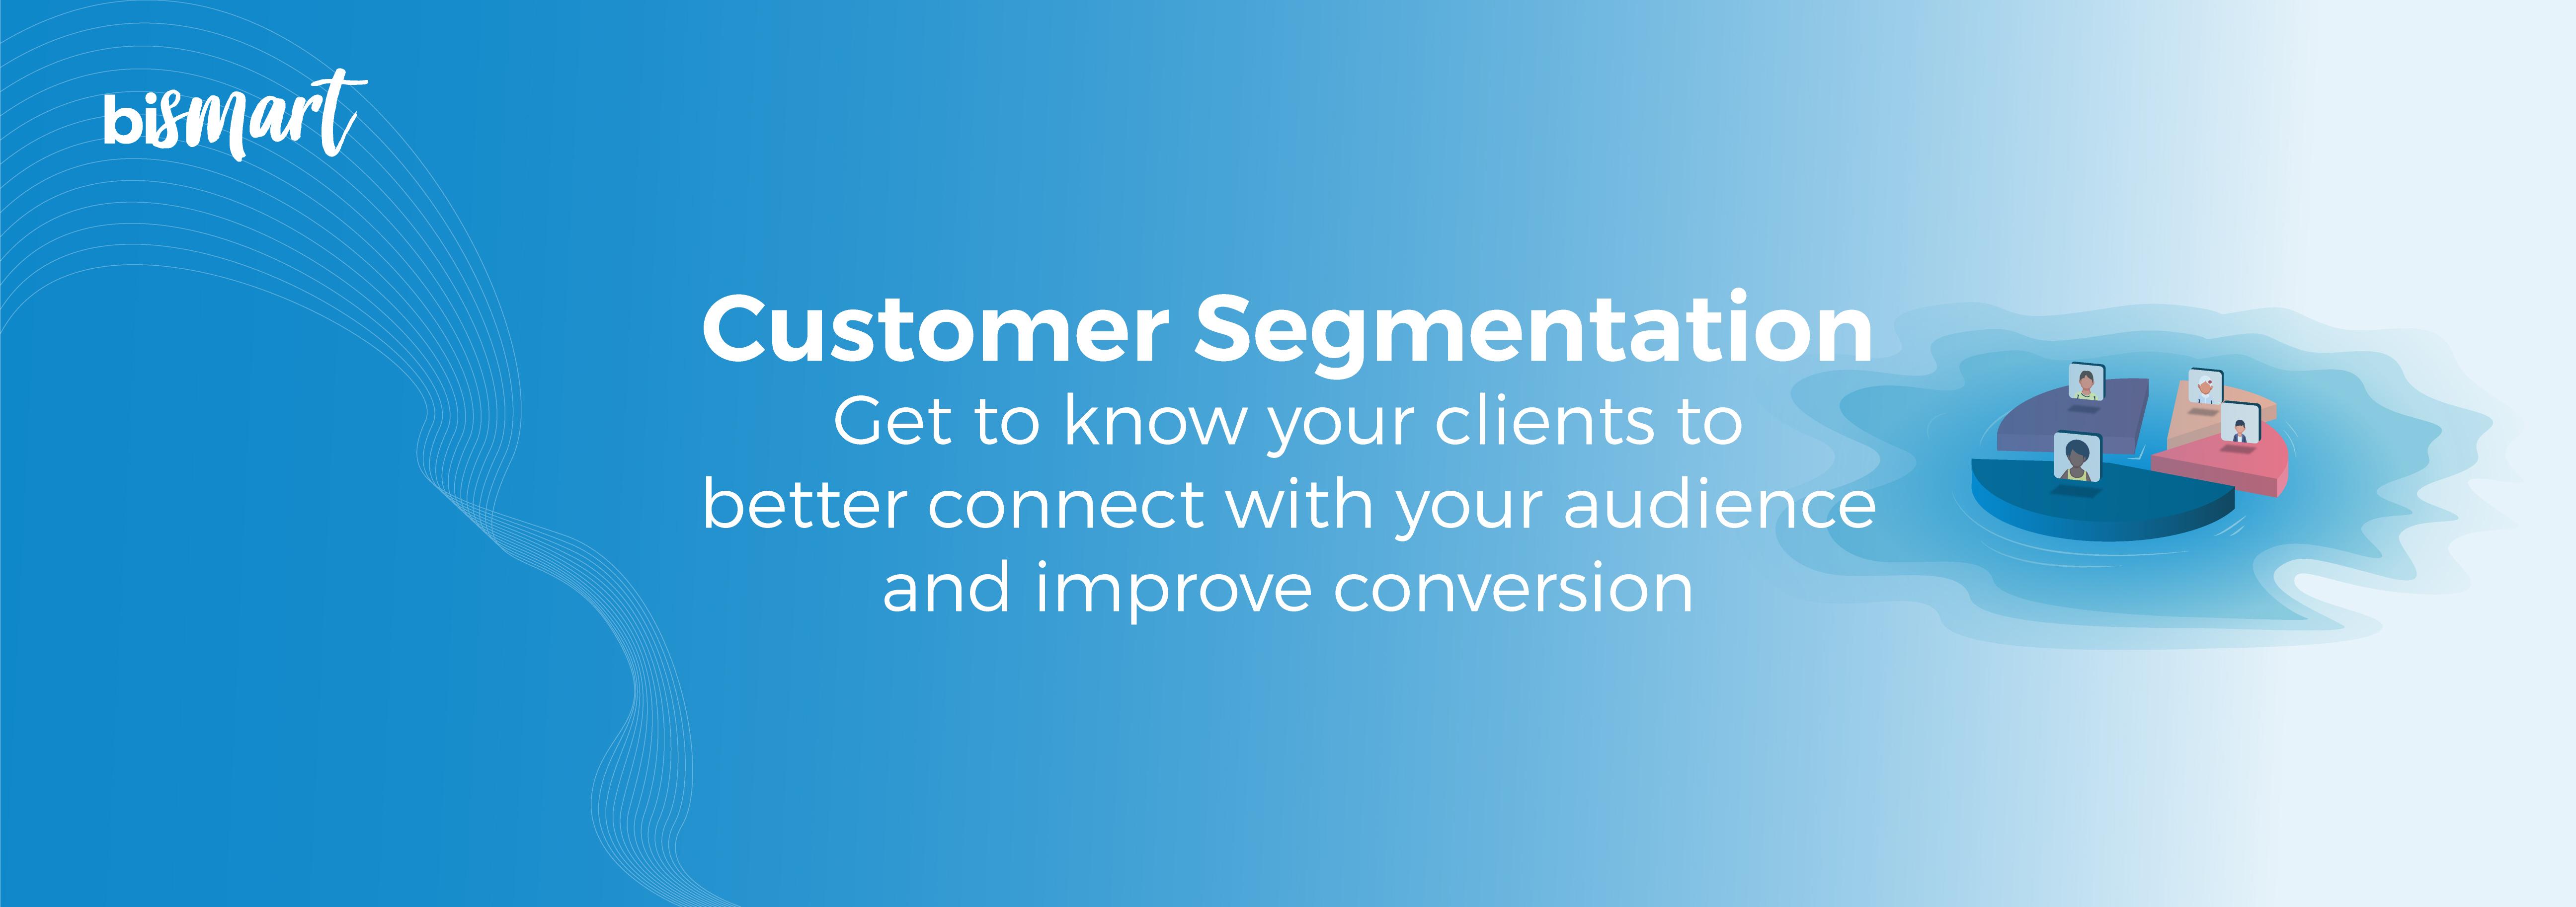 Customar-Segmentation-LandingEN01